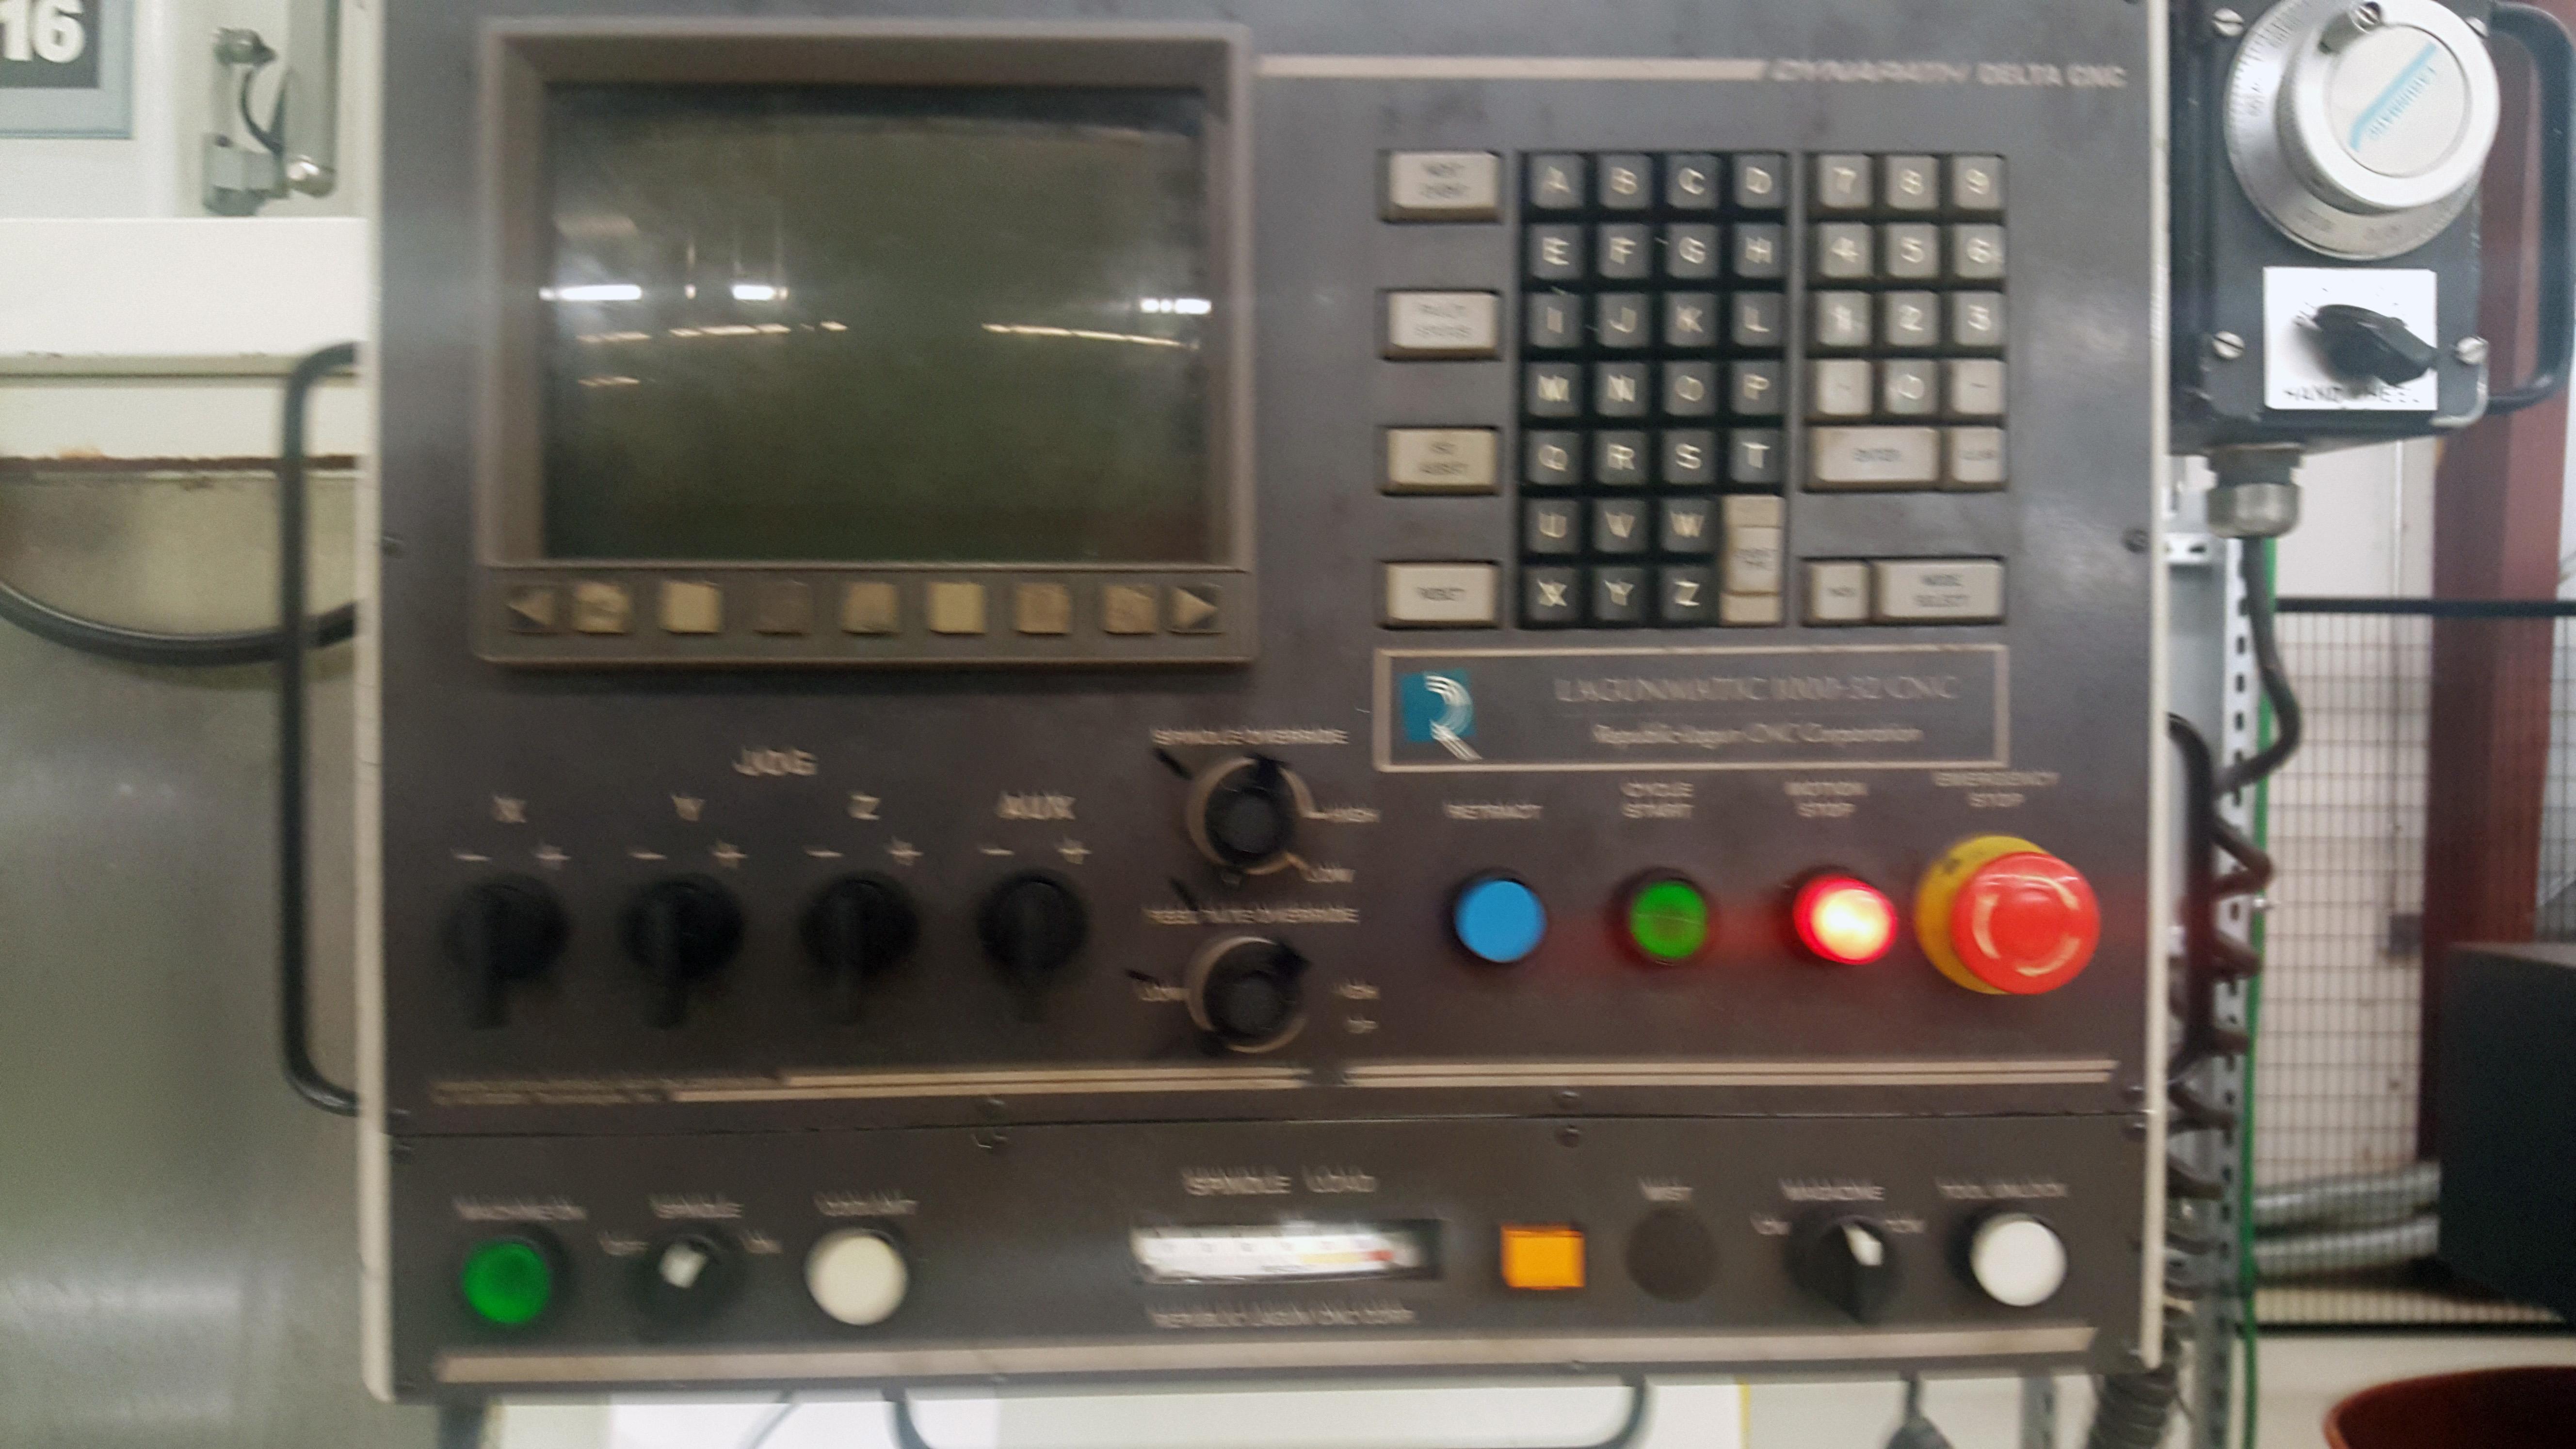 "Republic Lagun 4 Axis Model 3516 CNC Vertical Machining Center 16"" X 35"" table, 18 tools, 5000 - Image 2 of 6"